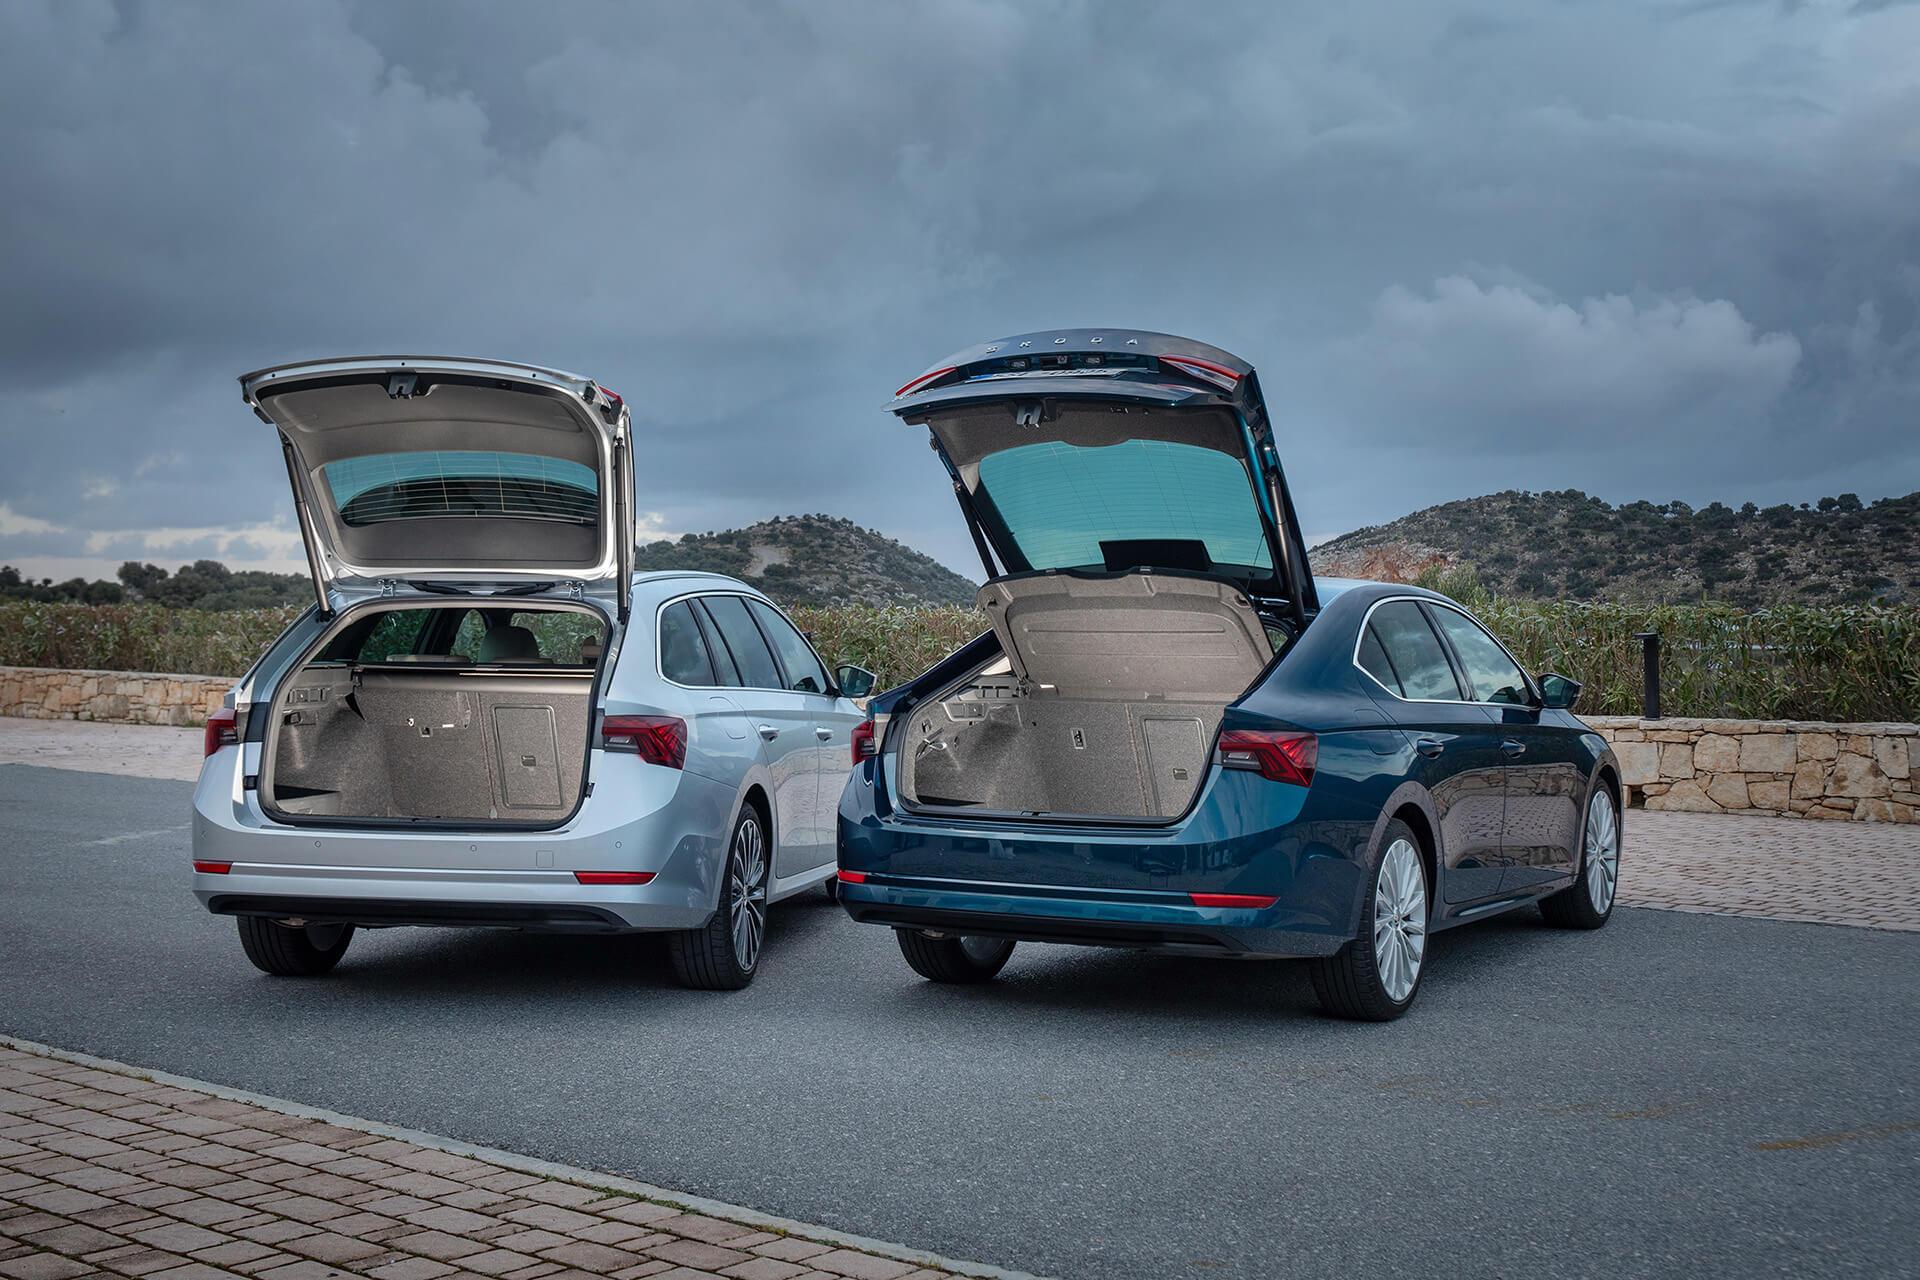 SKODA OCTAVIA Sportswagon και Grand Coupe σε χρώματα Lava Blue και Titan Blue - Χωρητικότητα πορτμπαγκάζ